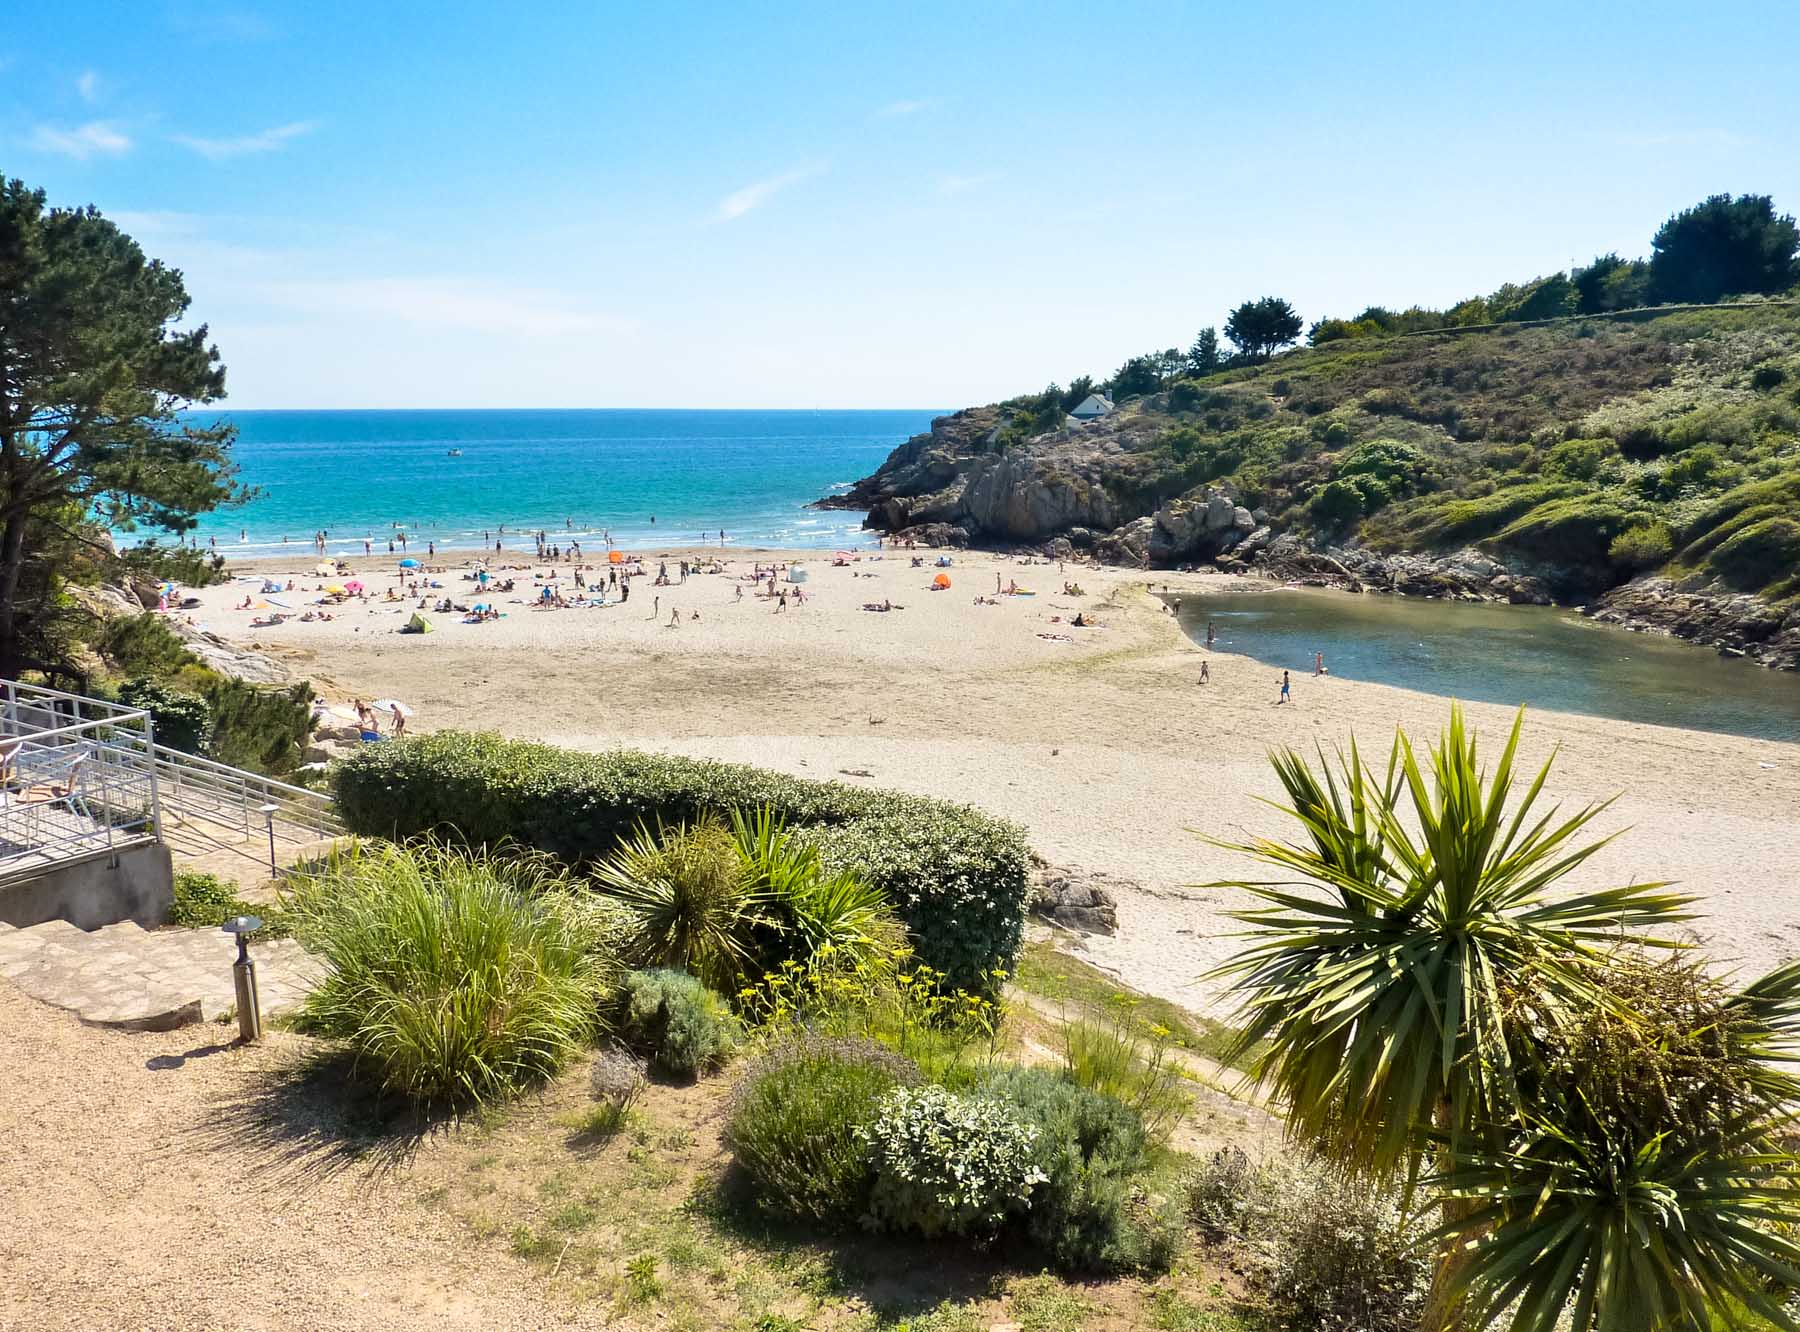 Anse_de_Rospico_Bretagne-du-Sud